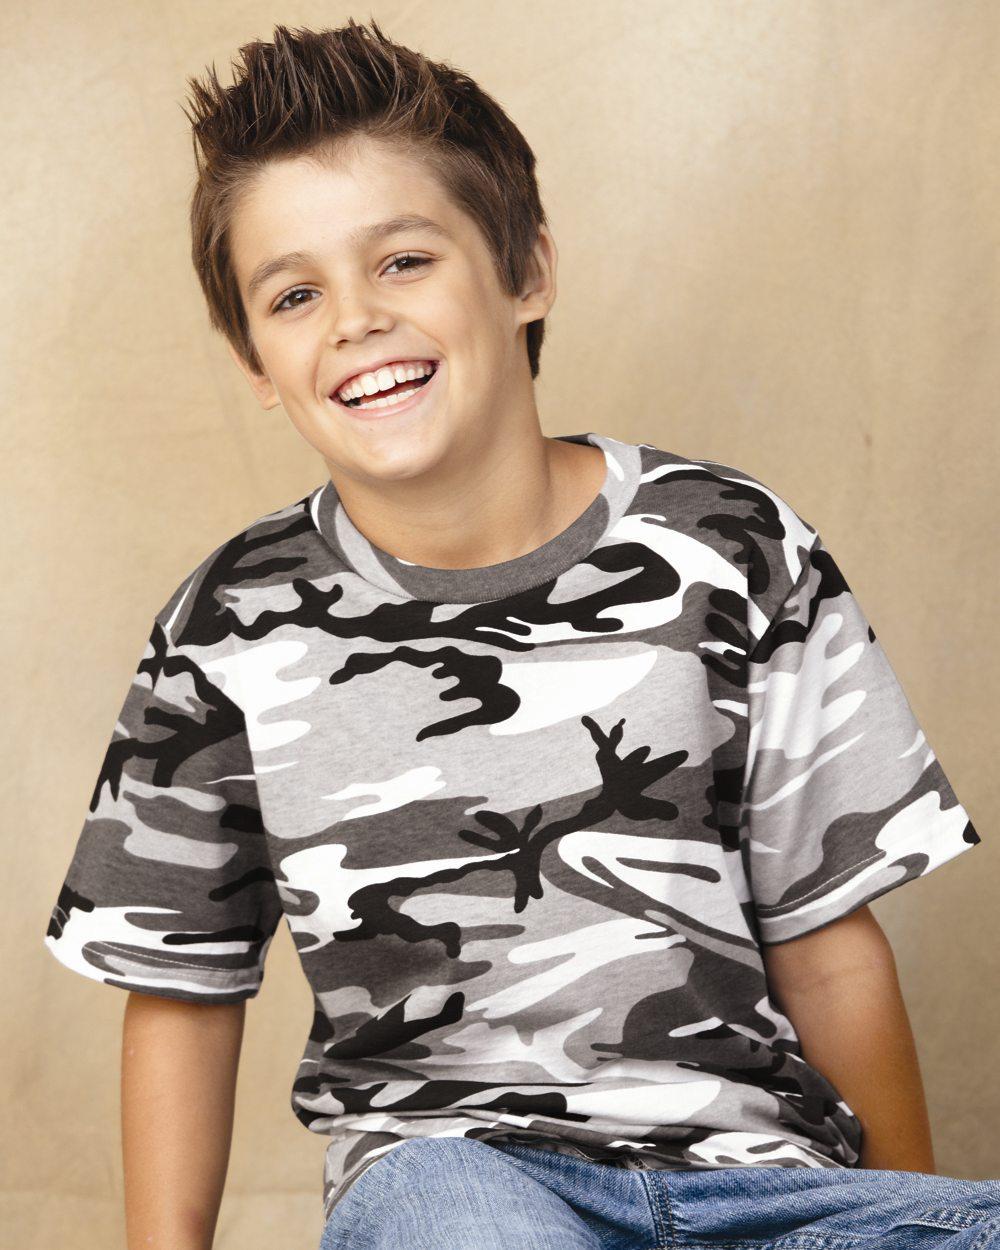 West Fargo School Suspends Kid For Wearing Camouflage Shirt